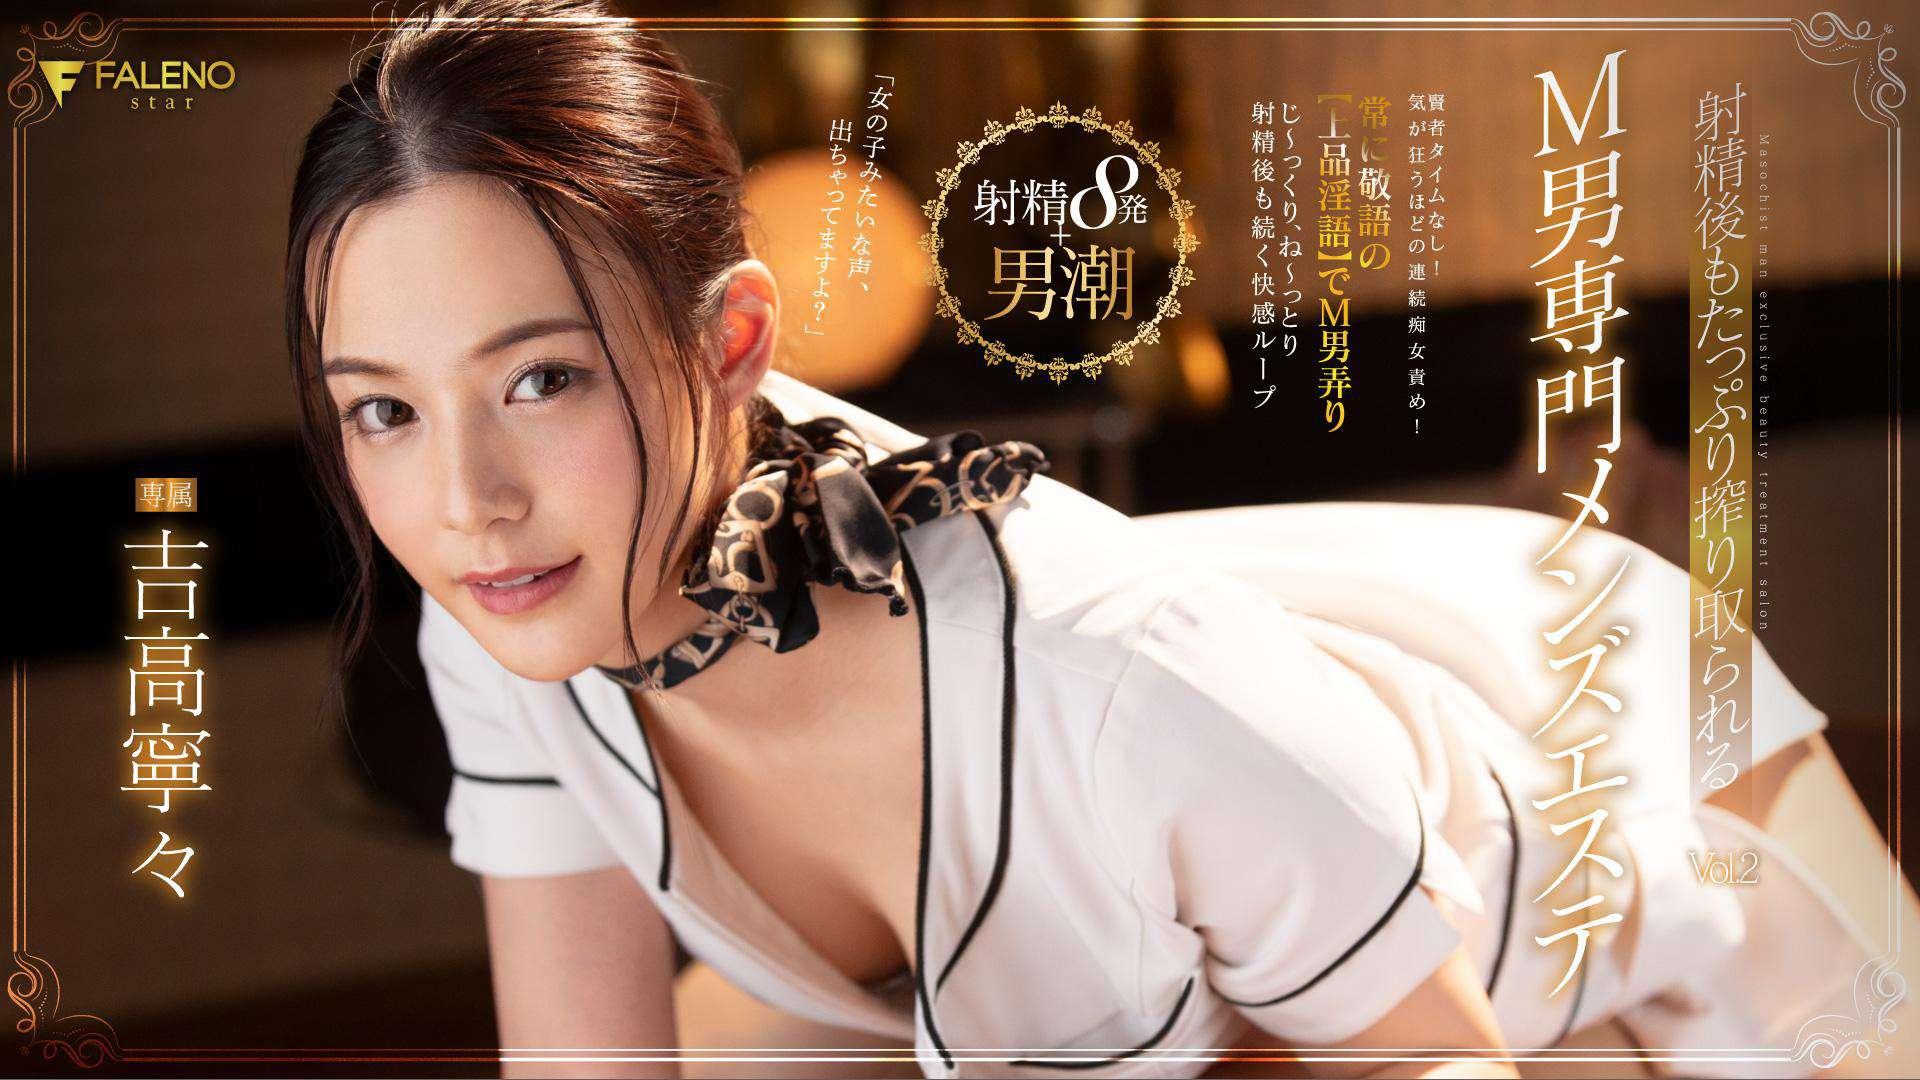 FLNS-239::吉高寧々专业为美容院服务